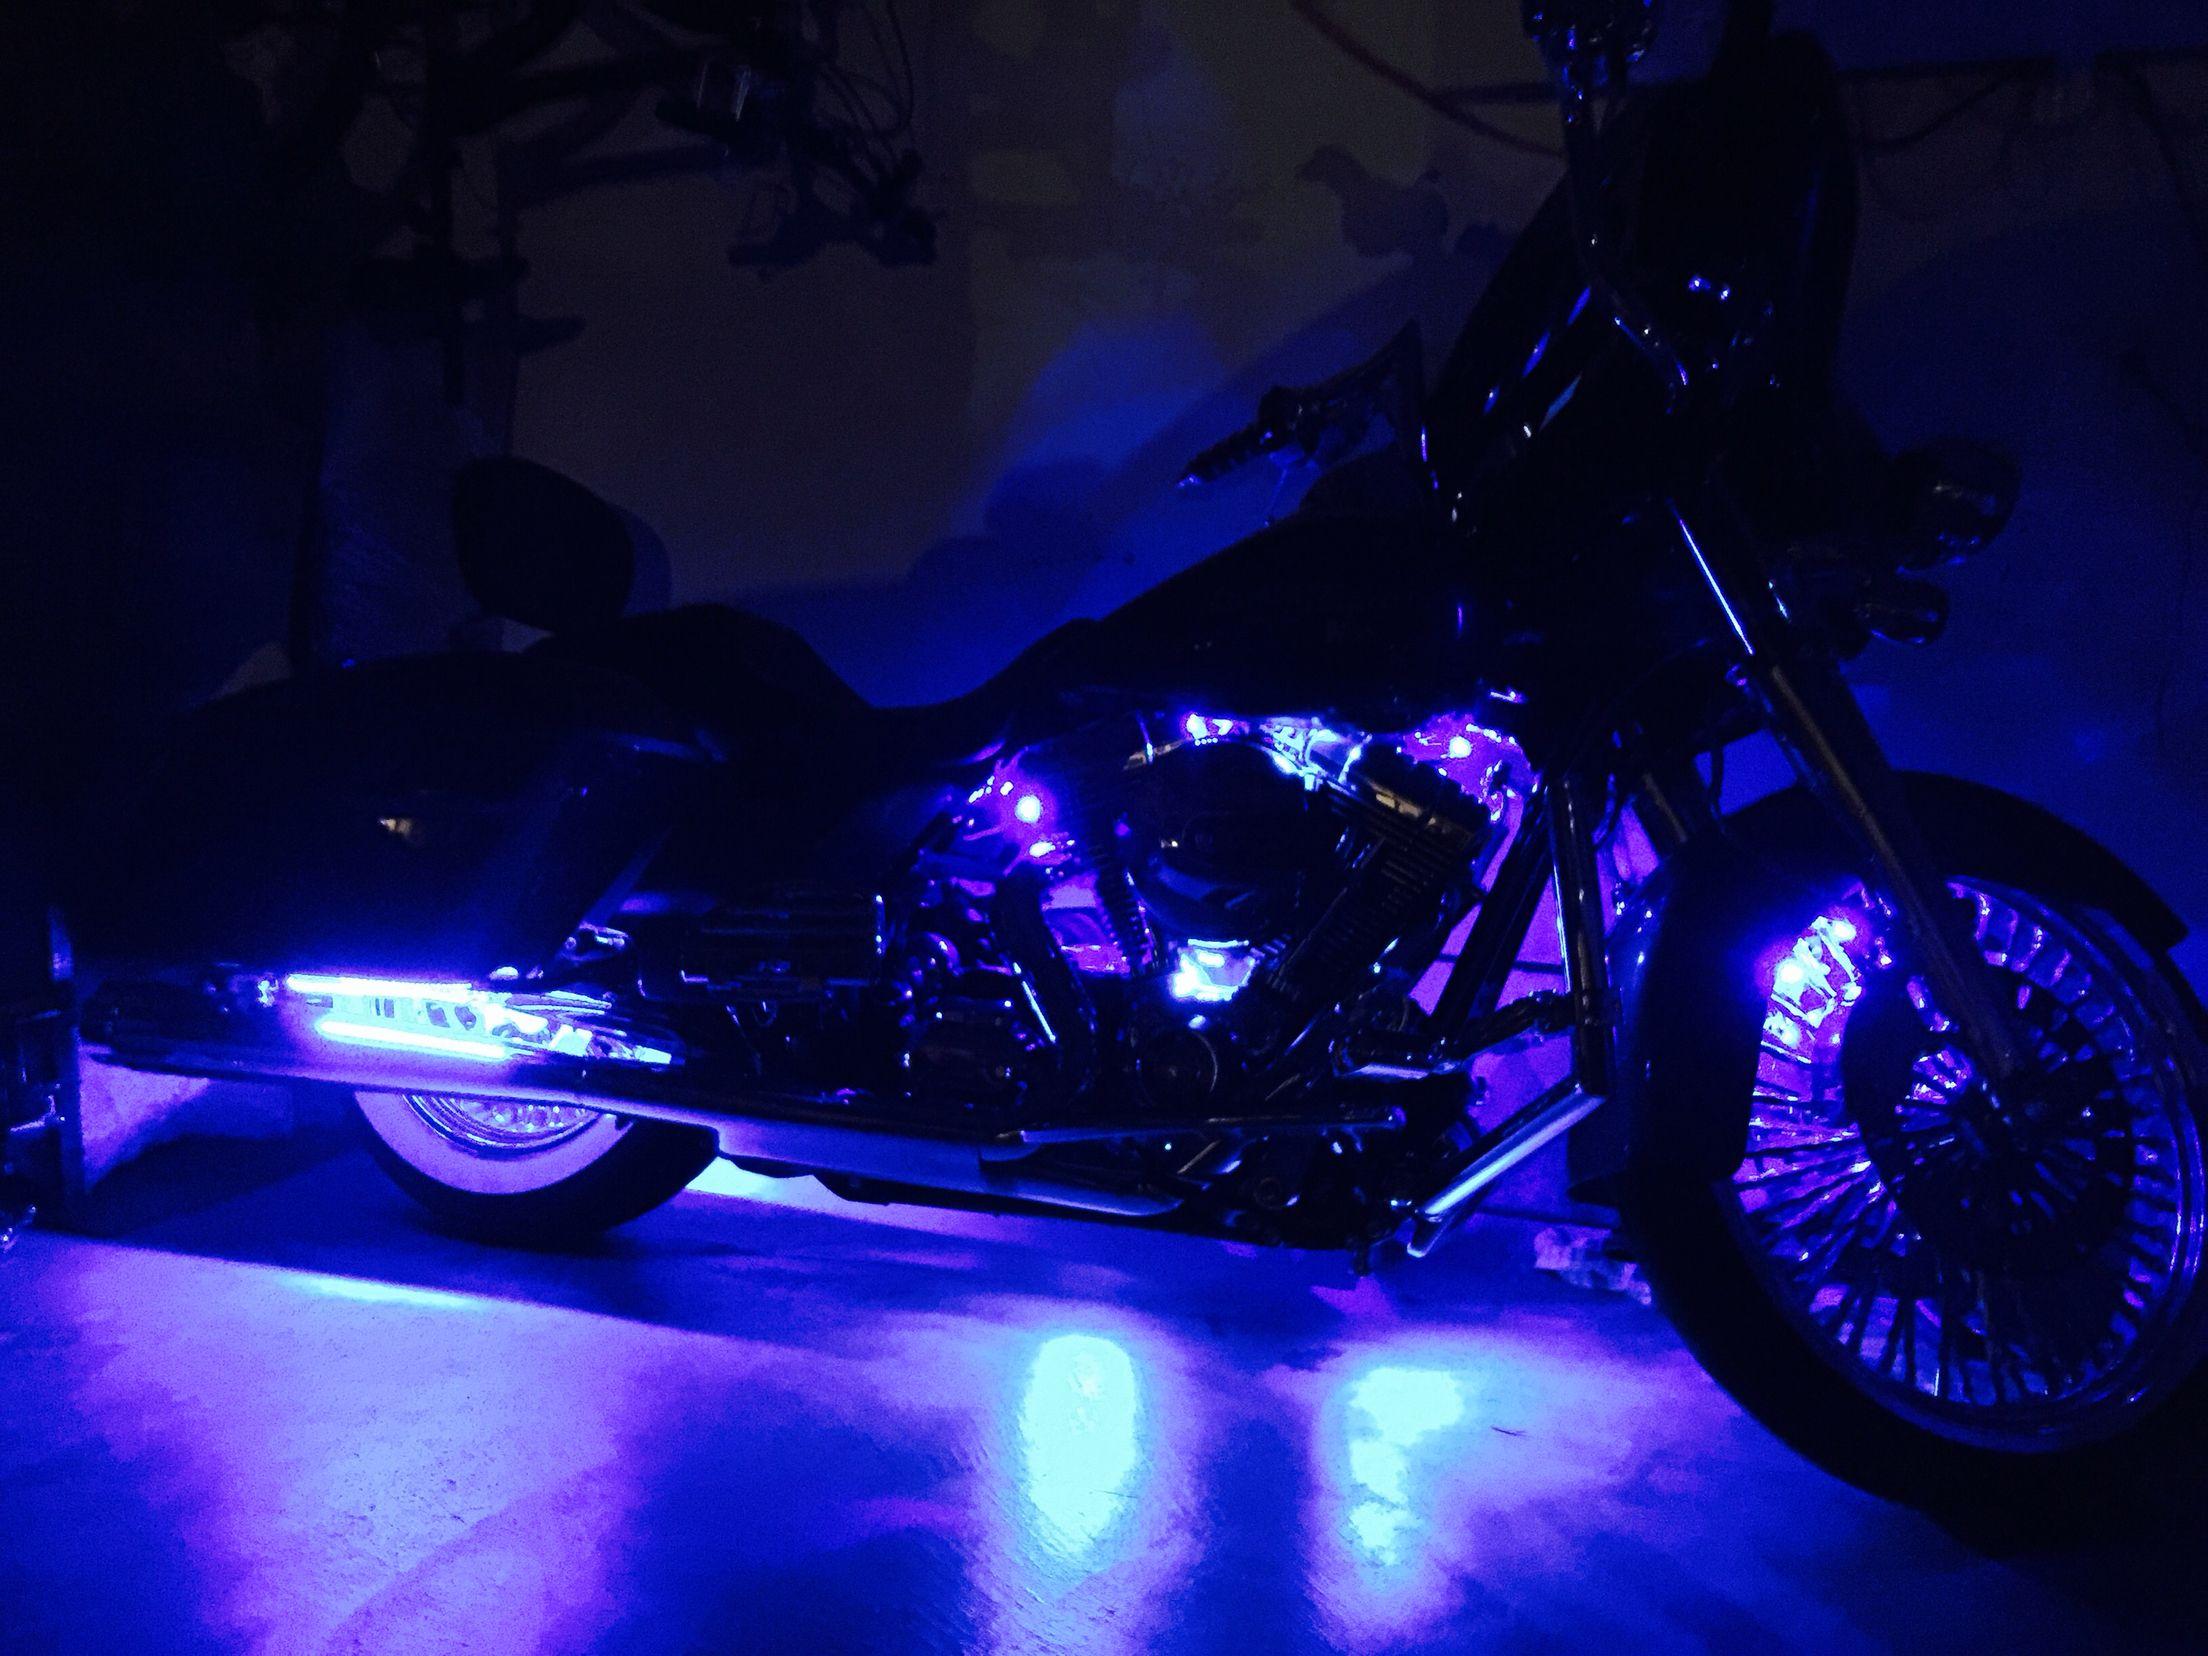 305 best harley davidson images on pinterest chicano art death dodger blue kristyandbryce Image collections